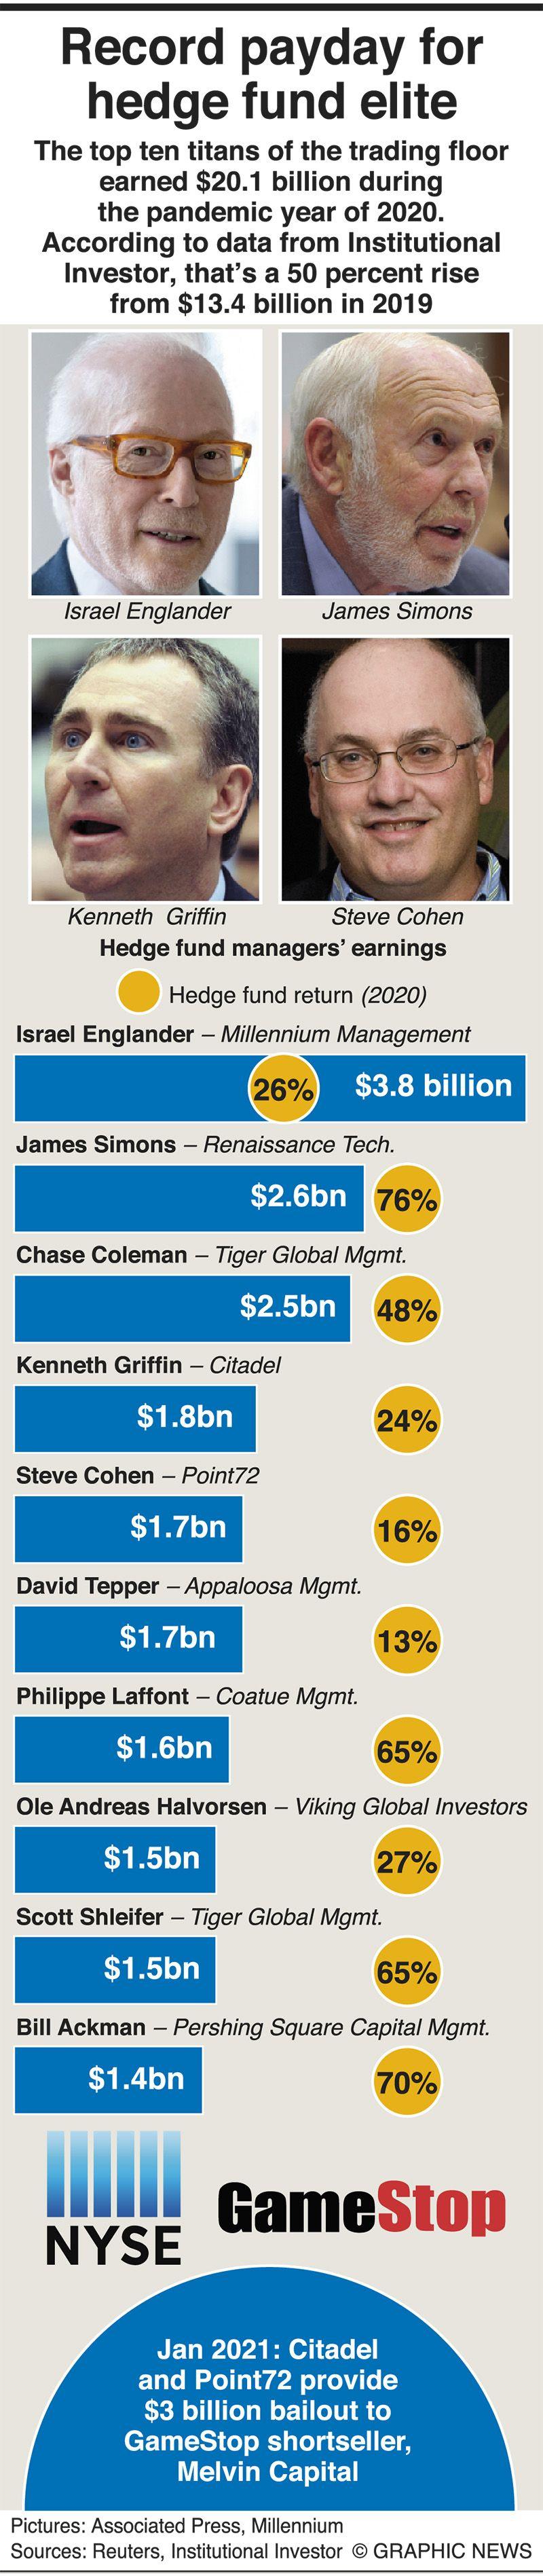 Hedge fund elite earn $20.1 billion